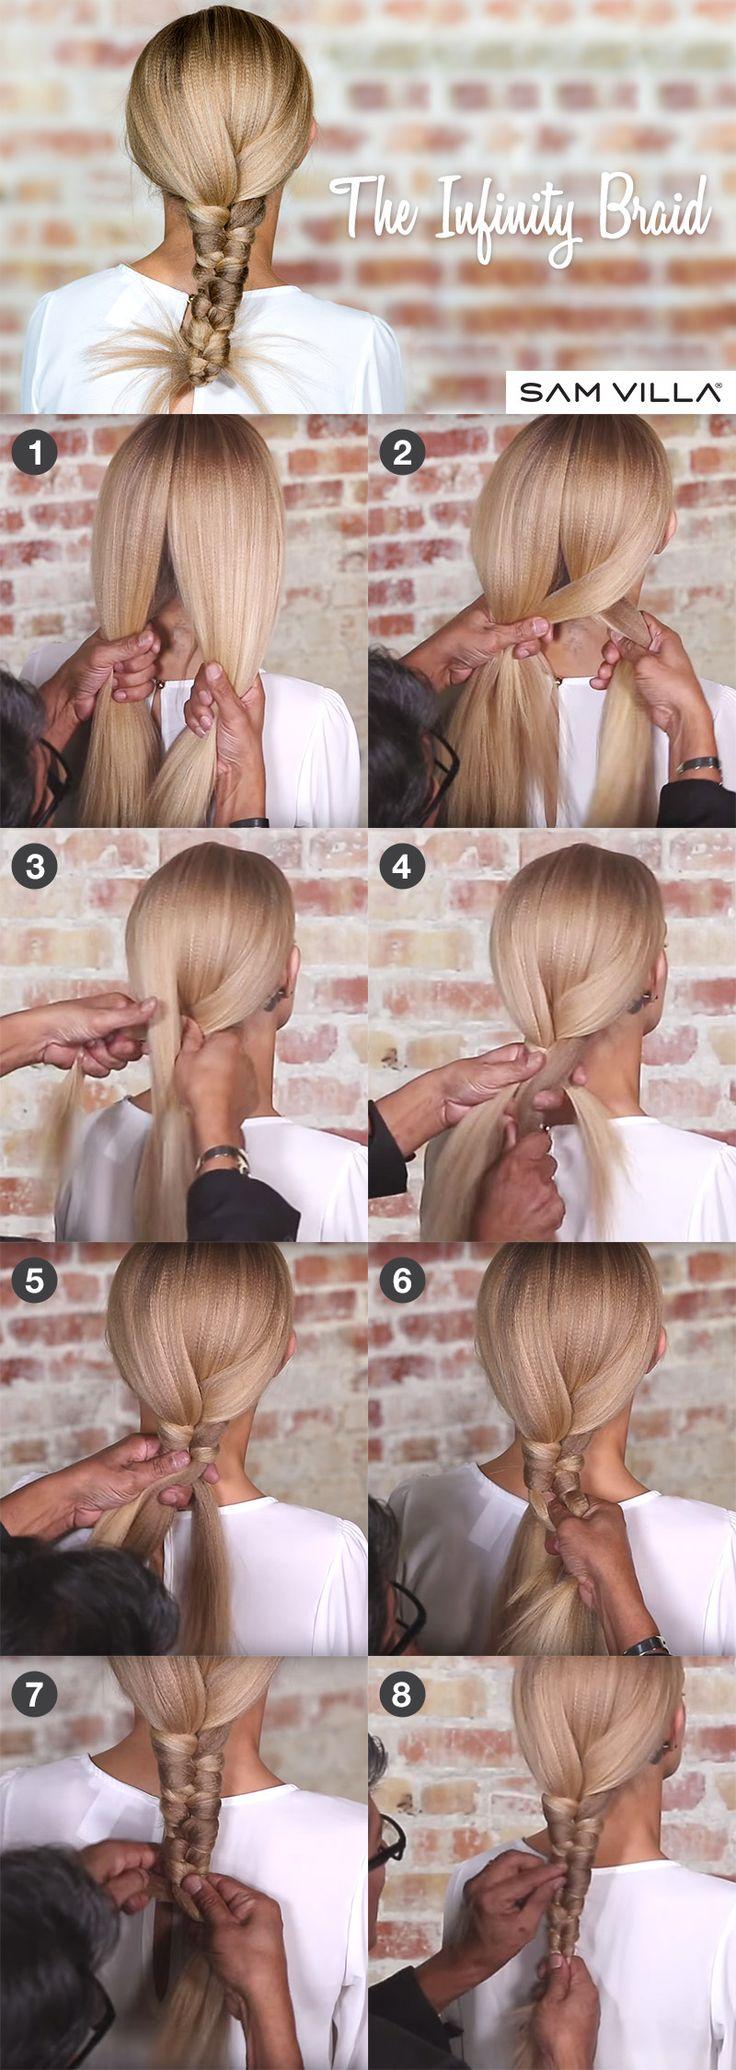 How to create an Infinity Braid by Sam Villa